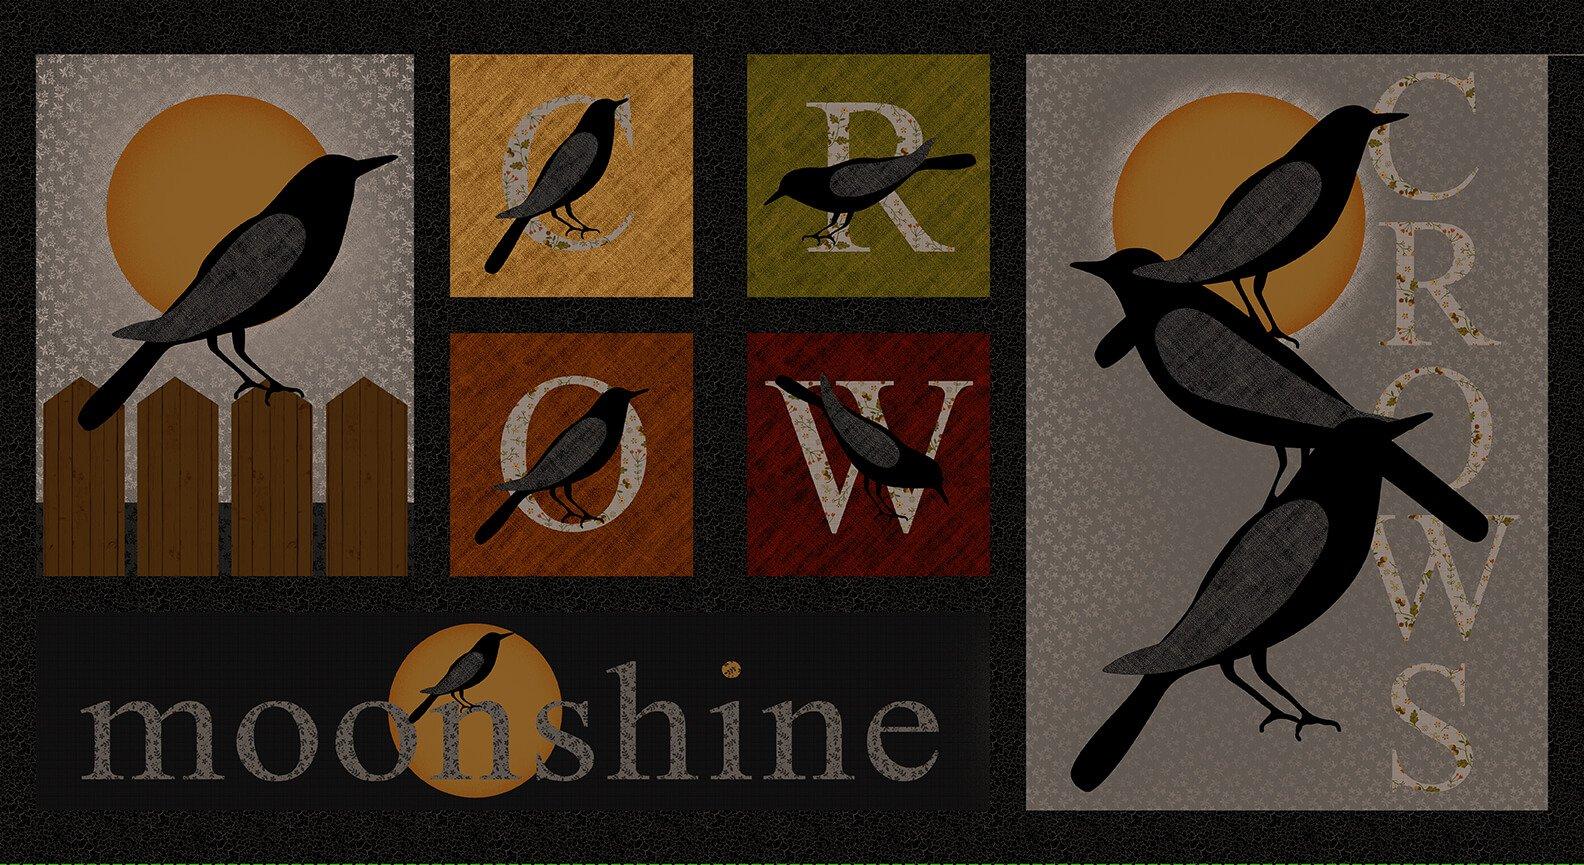 Moonshine 2527P-99 Black